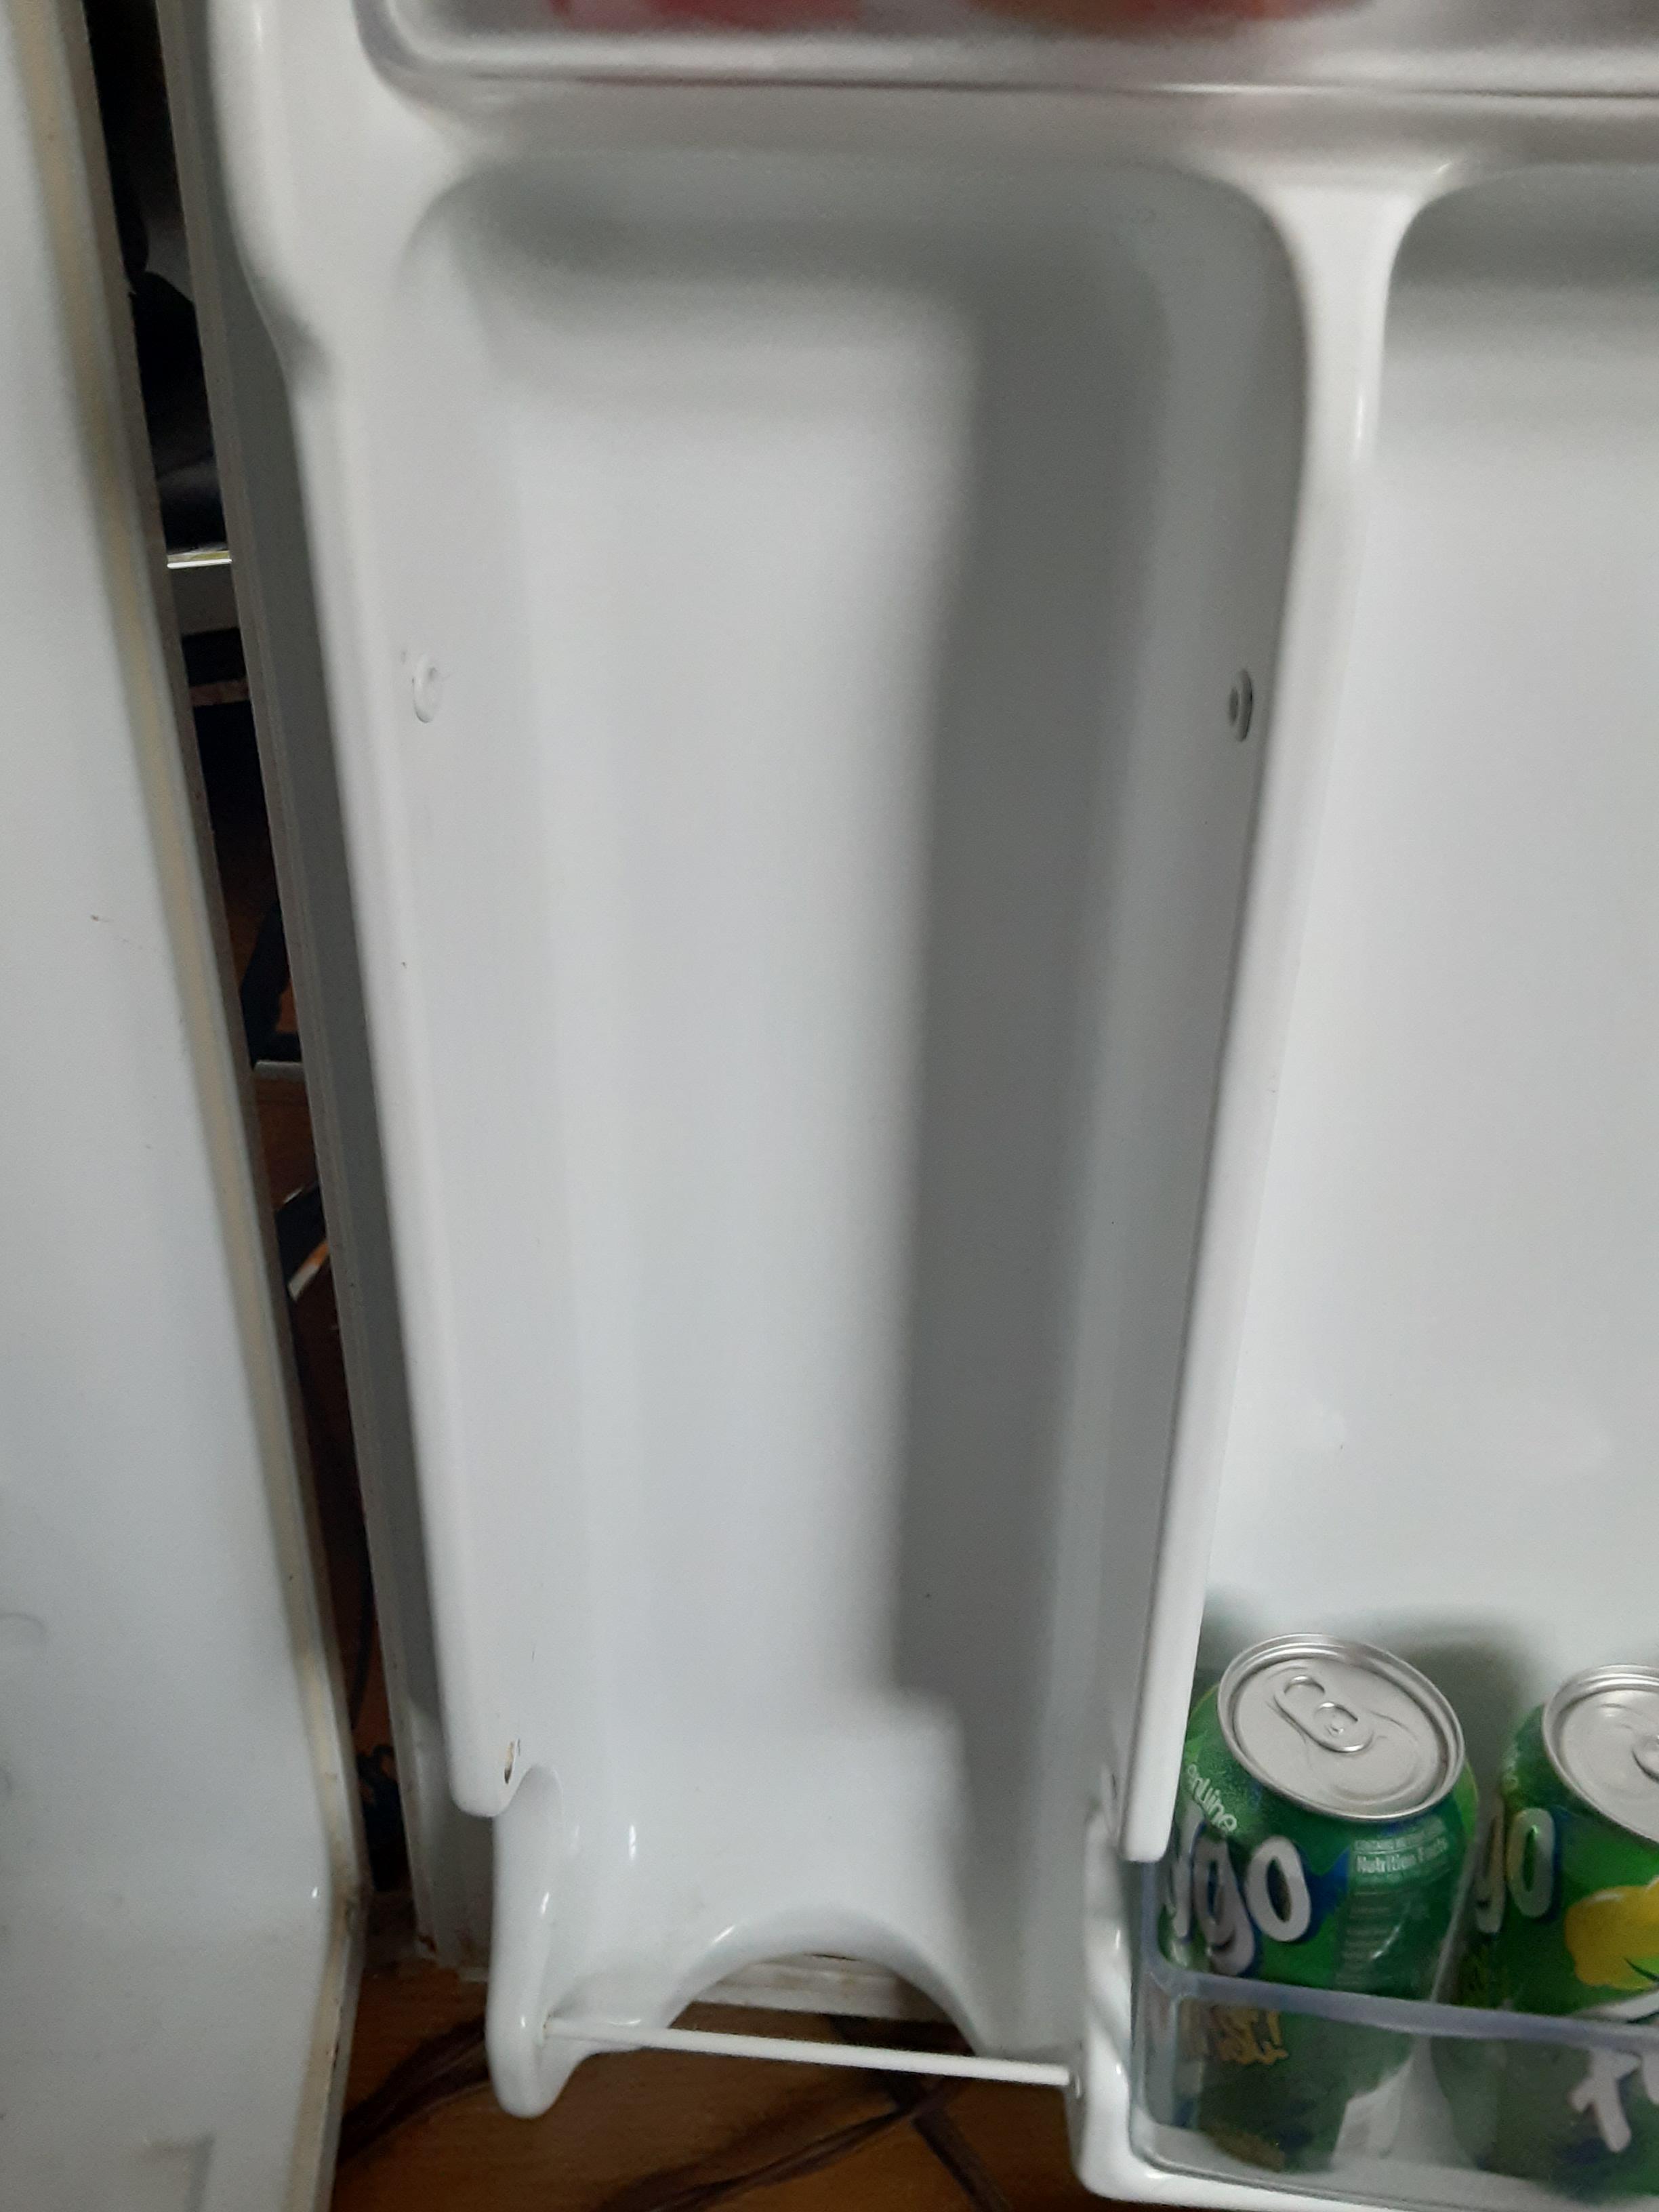 soda holder bars on a ge mini fridge